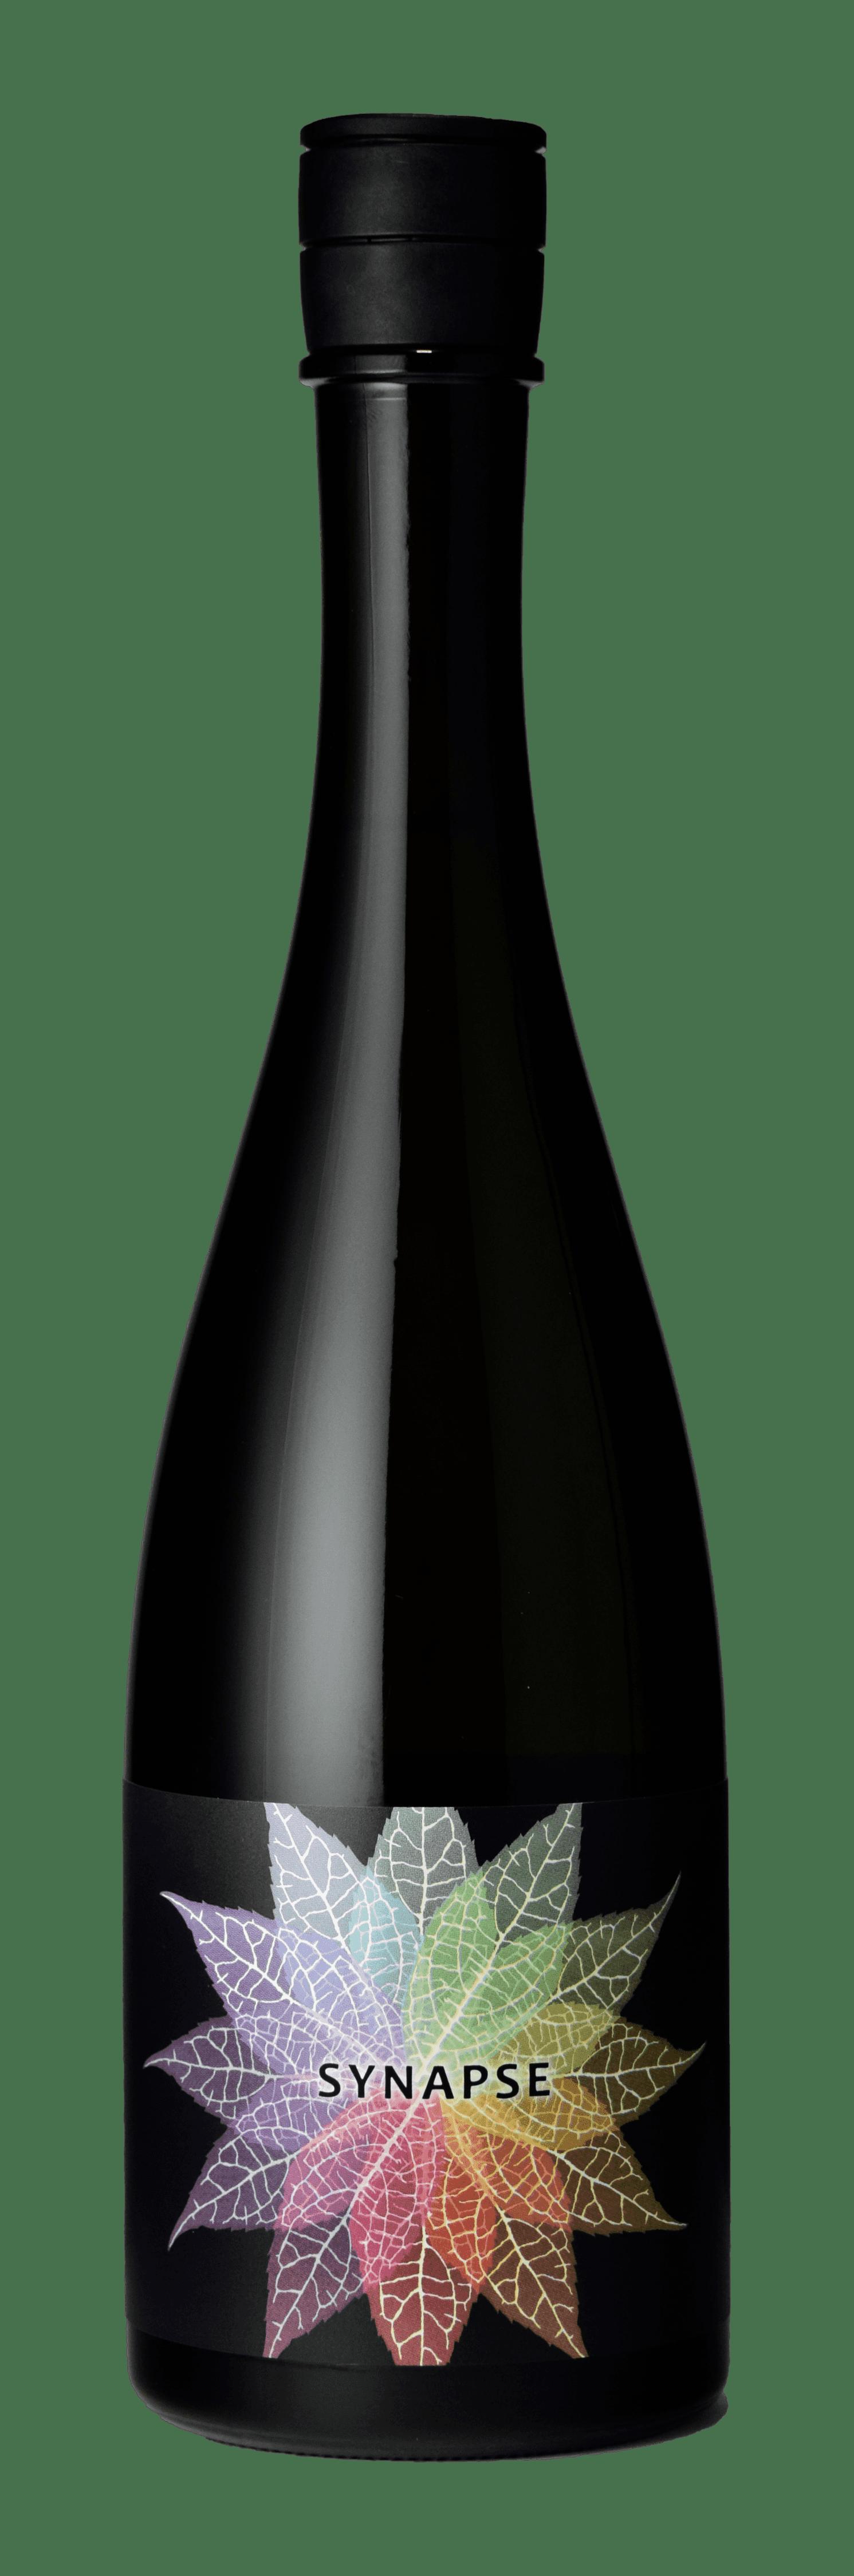 酒蔵「竹野酒造」SYNAPSE2019 720ml